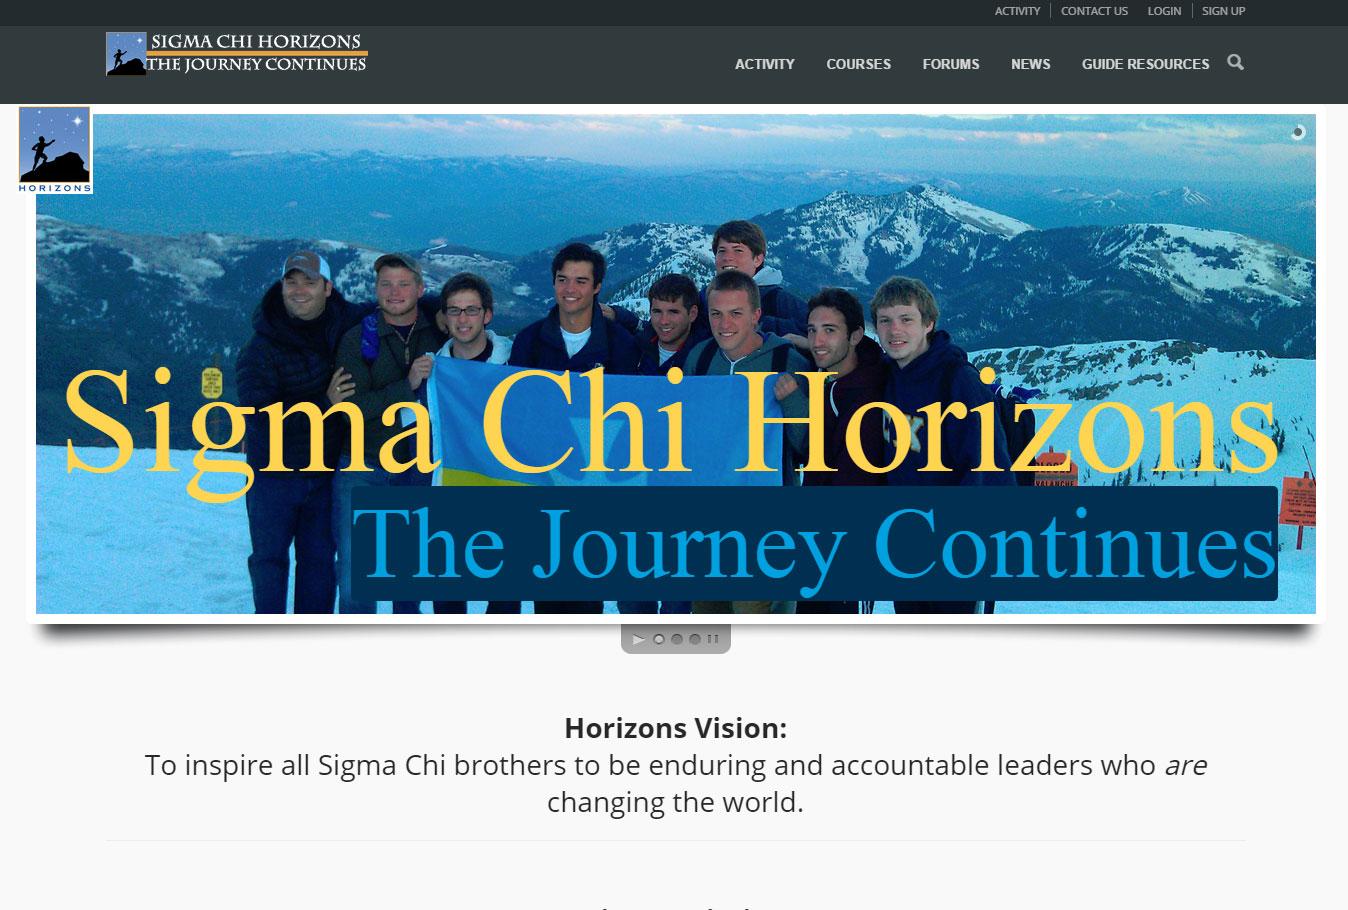 Sigma Chi Horizons Leadership Summit